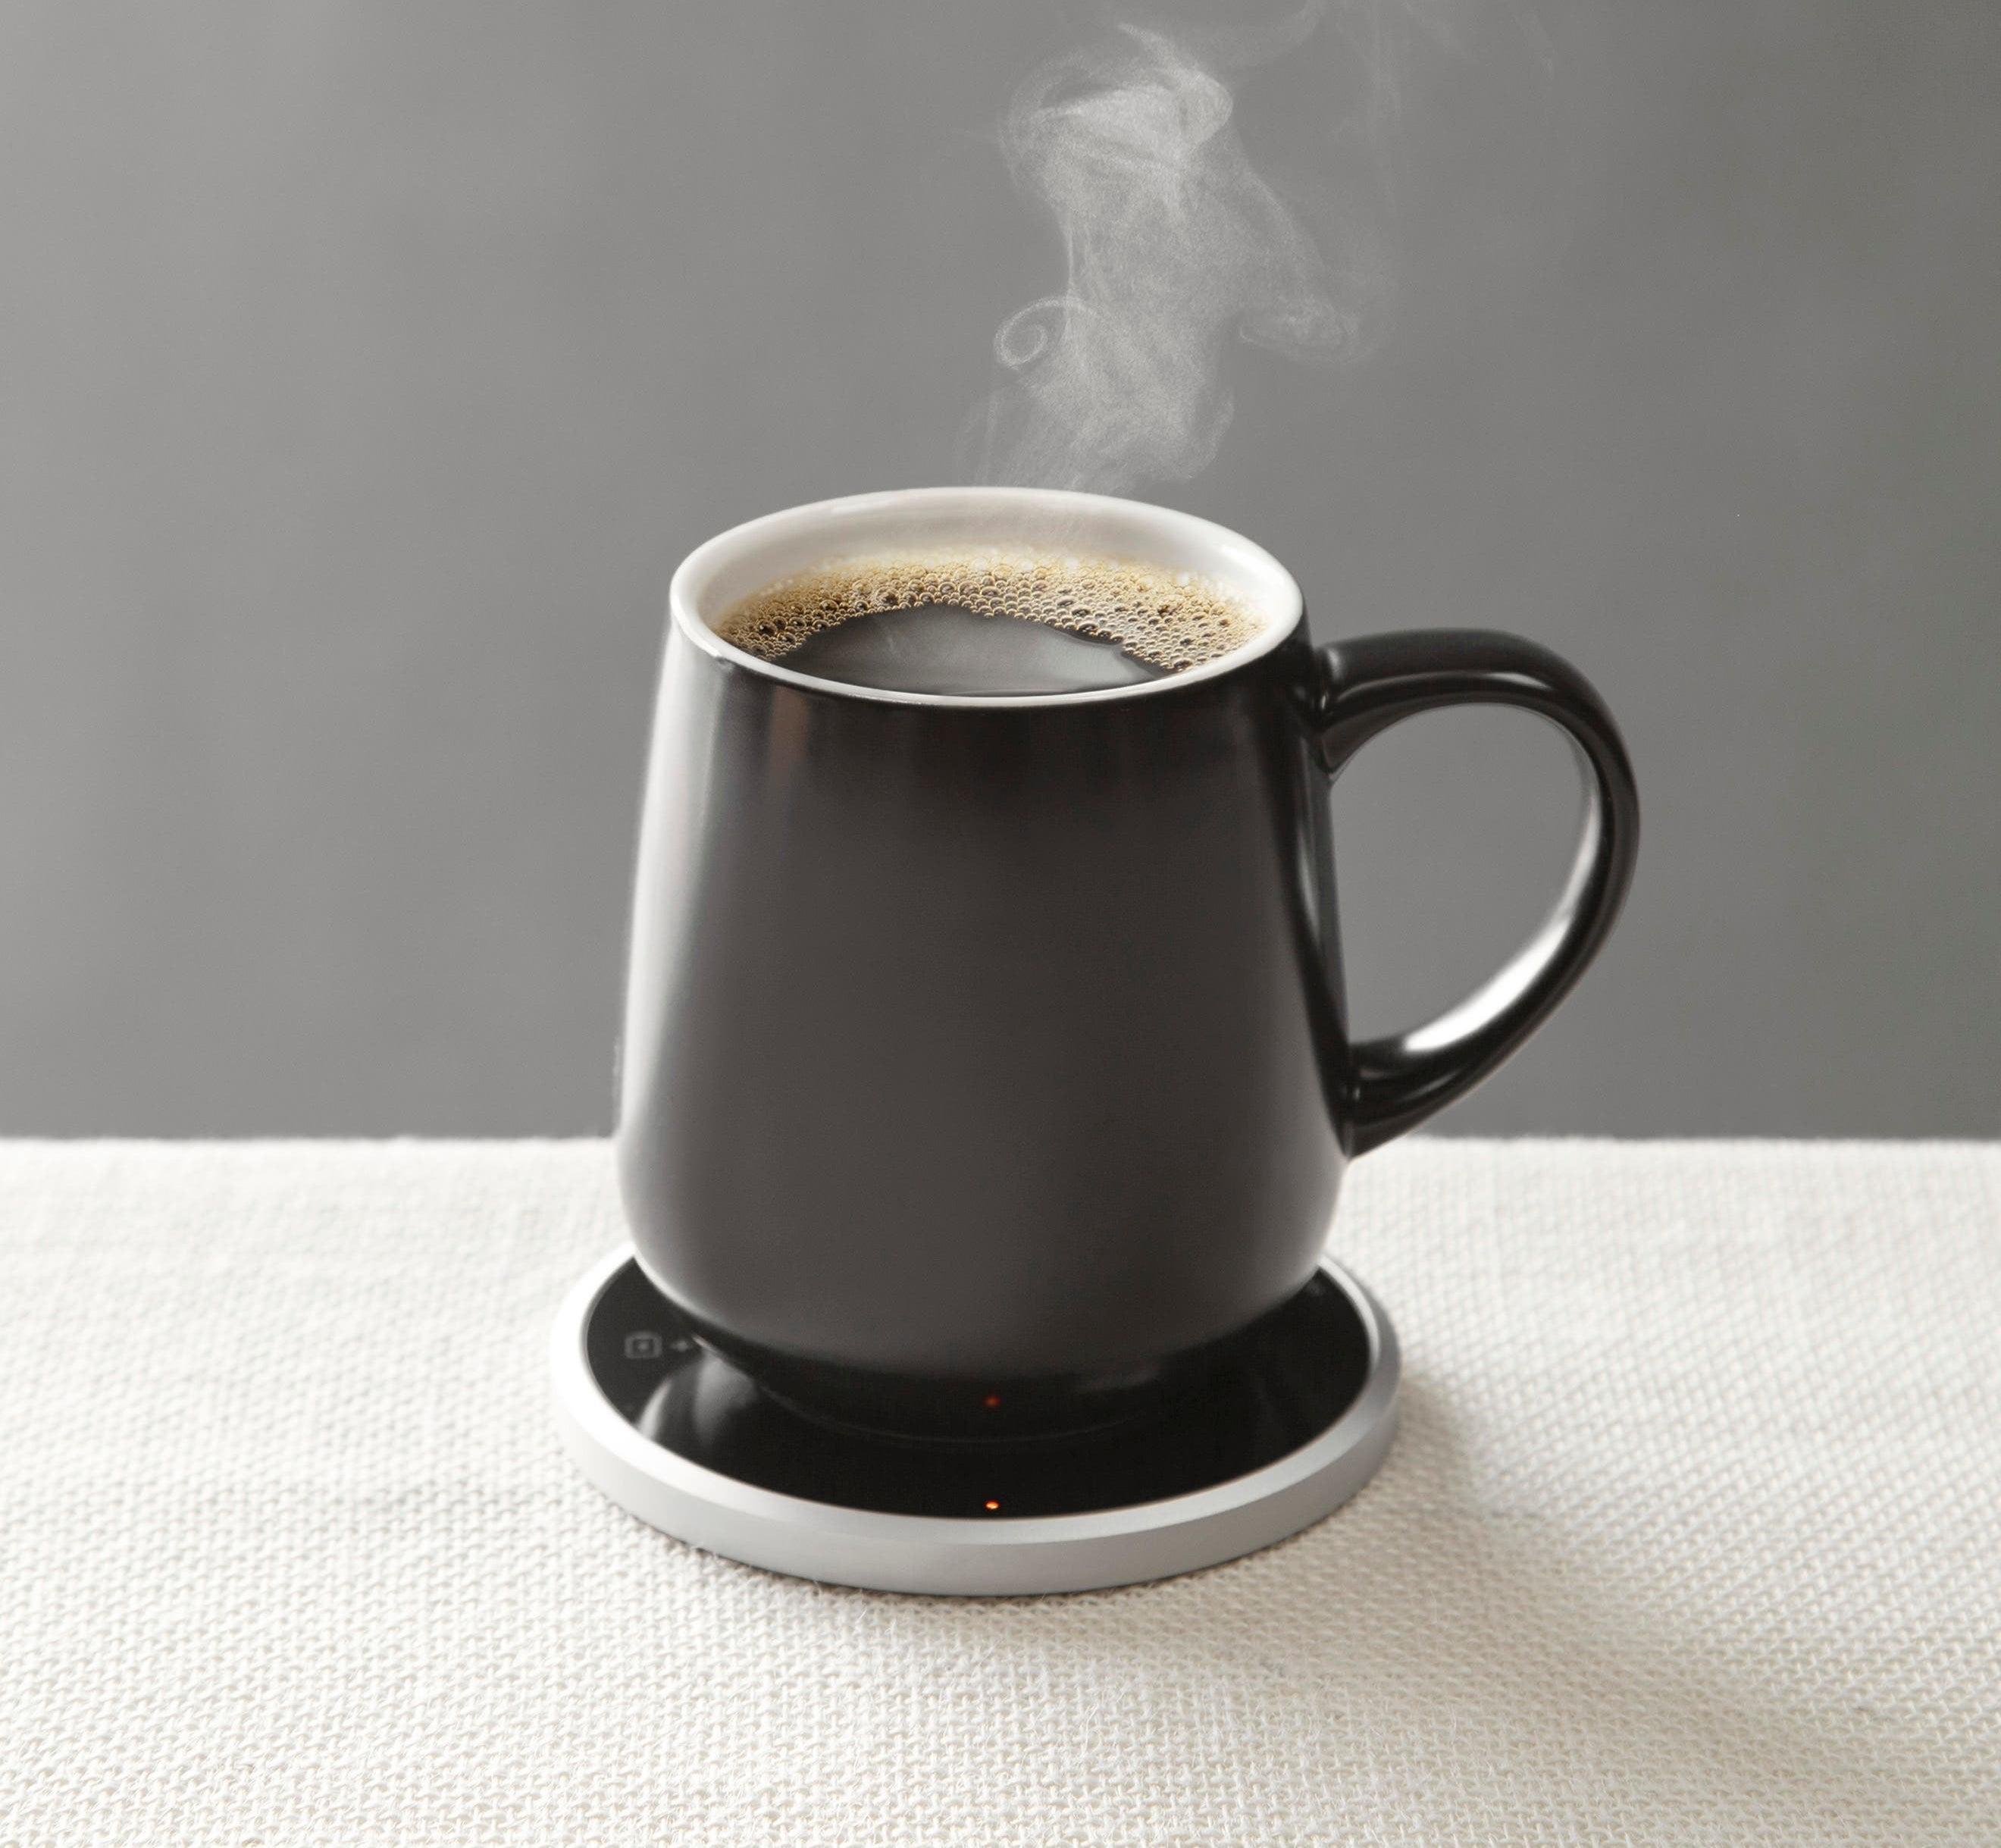 a coffee mug on the heating plate